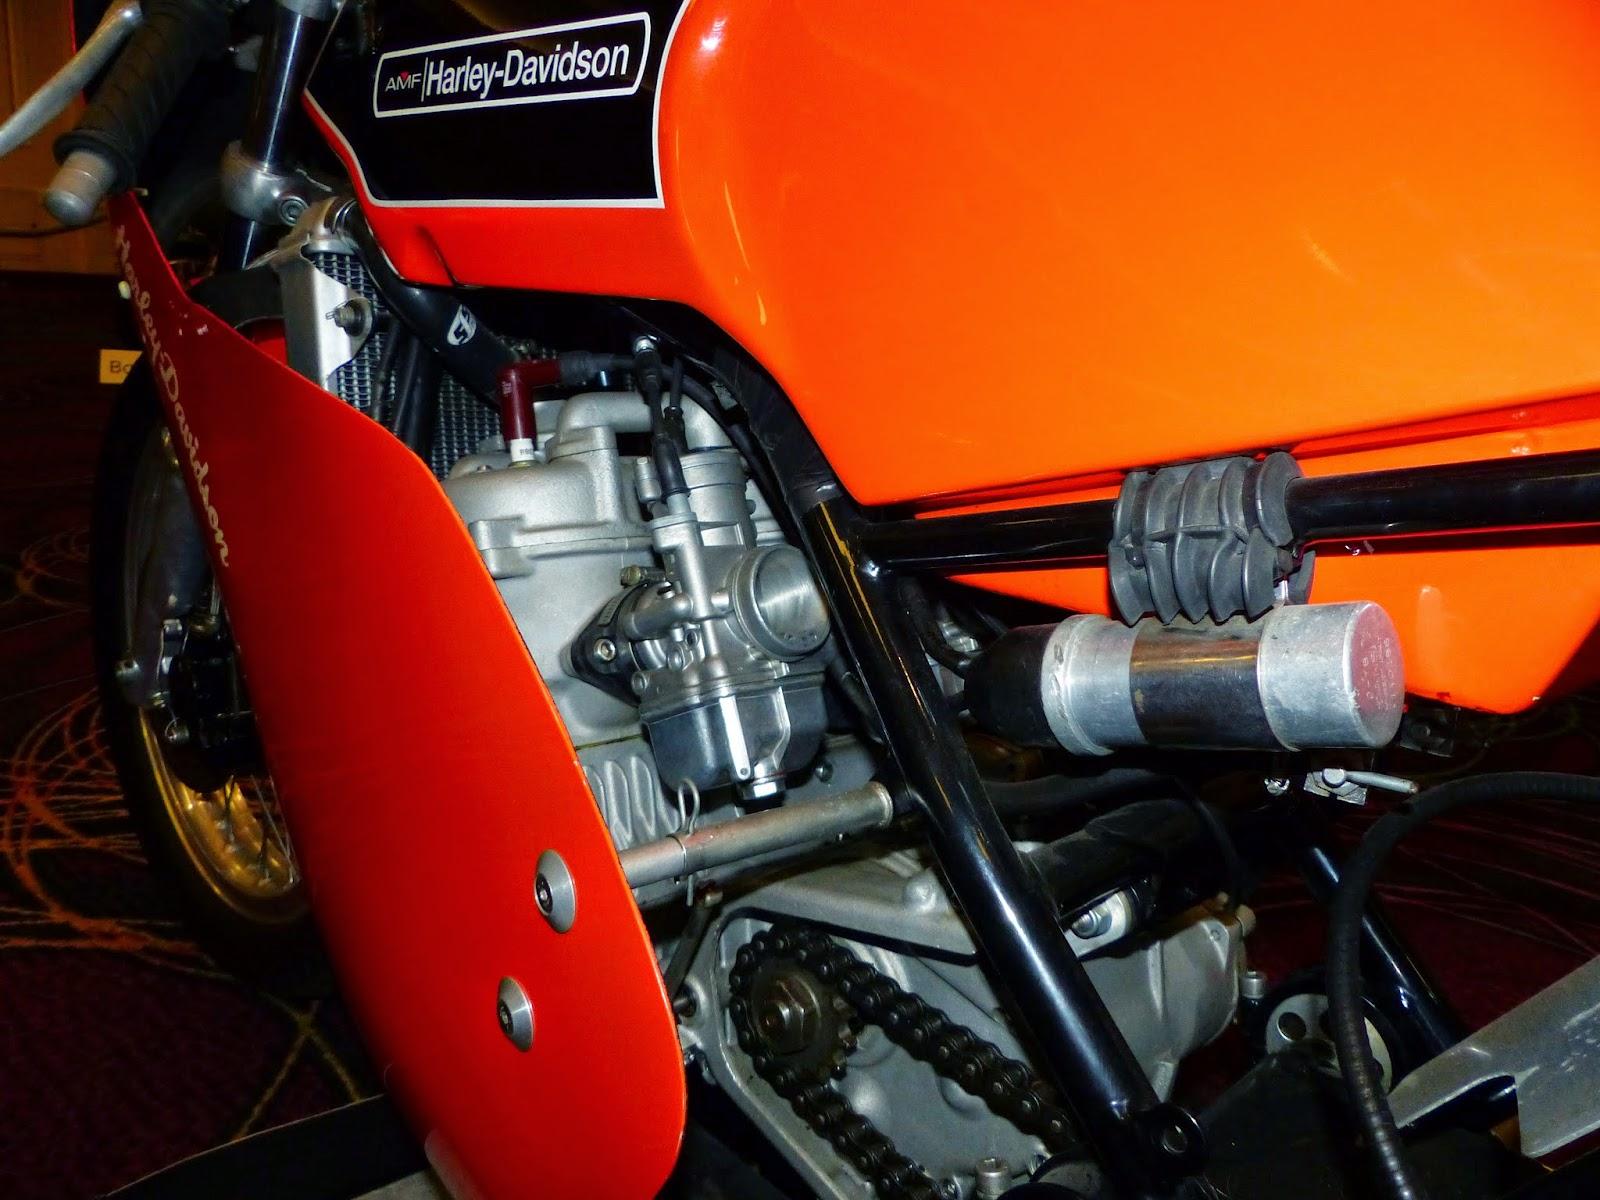 Harley Davidson: OldMotoDude: 1974 Harley-Davidson/Aermacchi RR350 Sold For